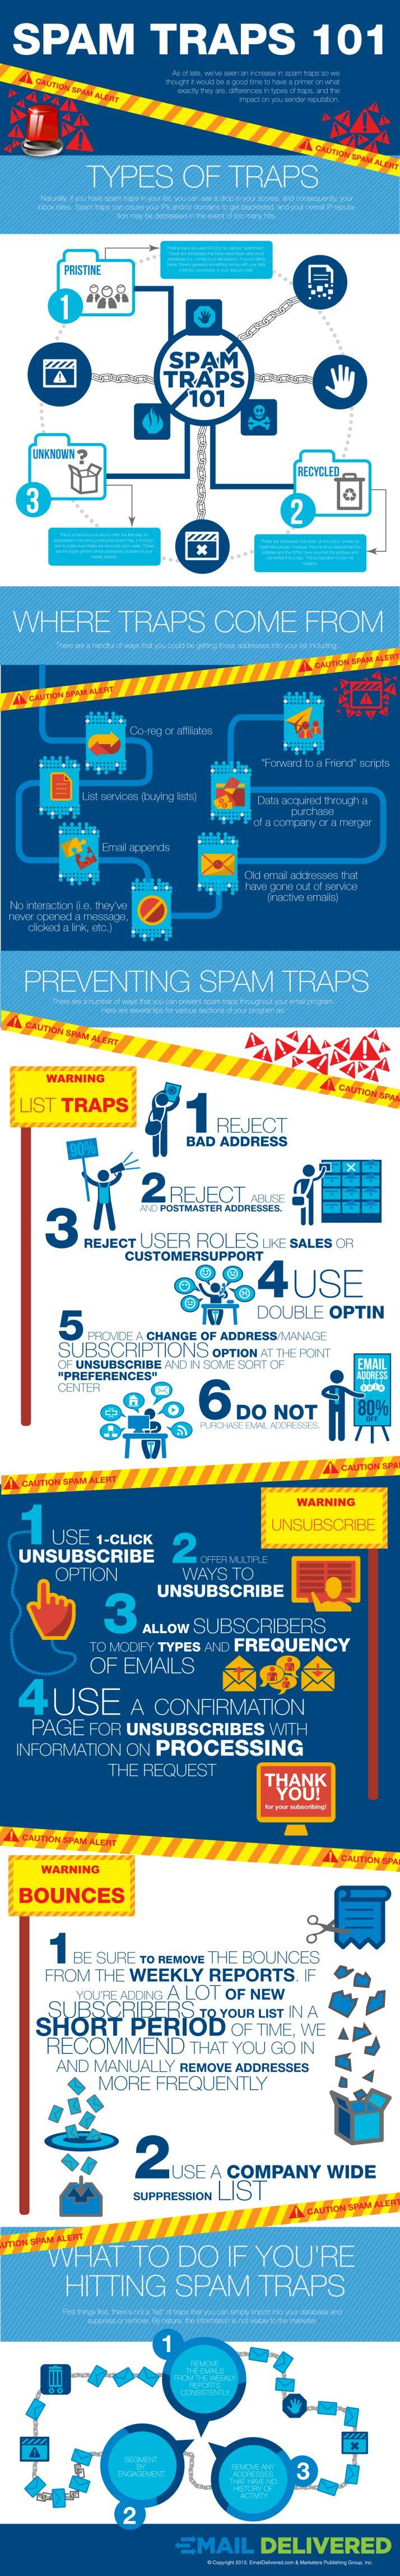 #Spam Traps #infografia #infographic #internet